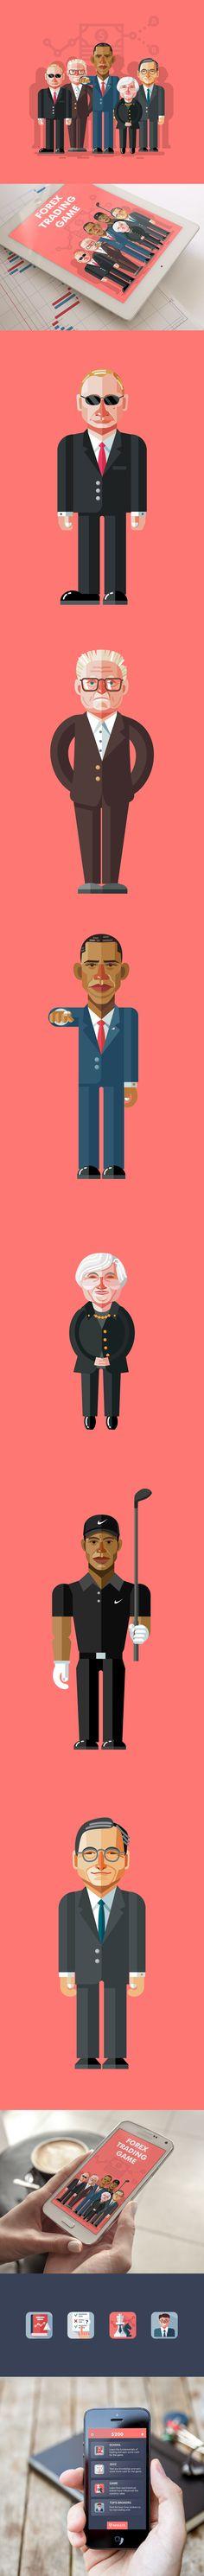 Illustration Vladimir Putin Russia- Obama United States - Angela Merkel Germany Flat Design